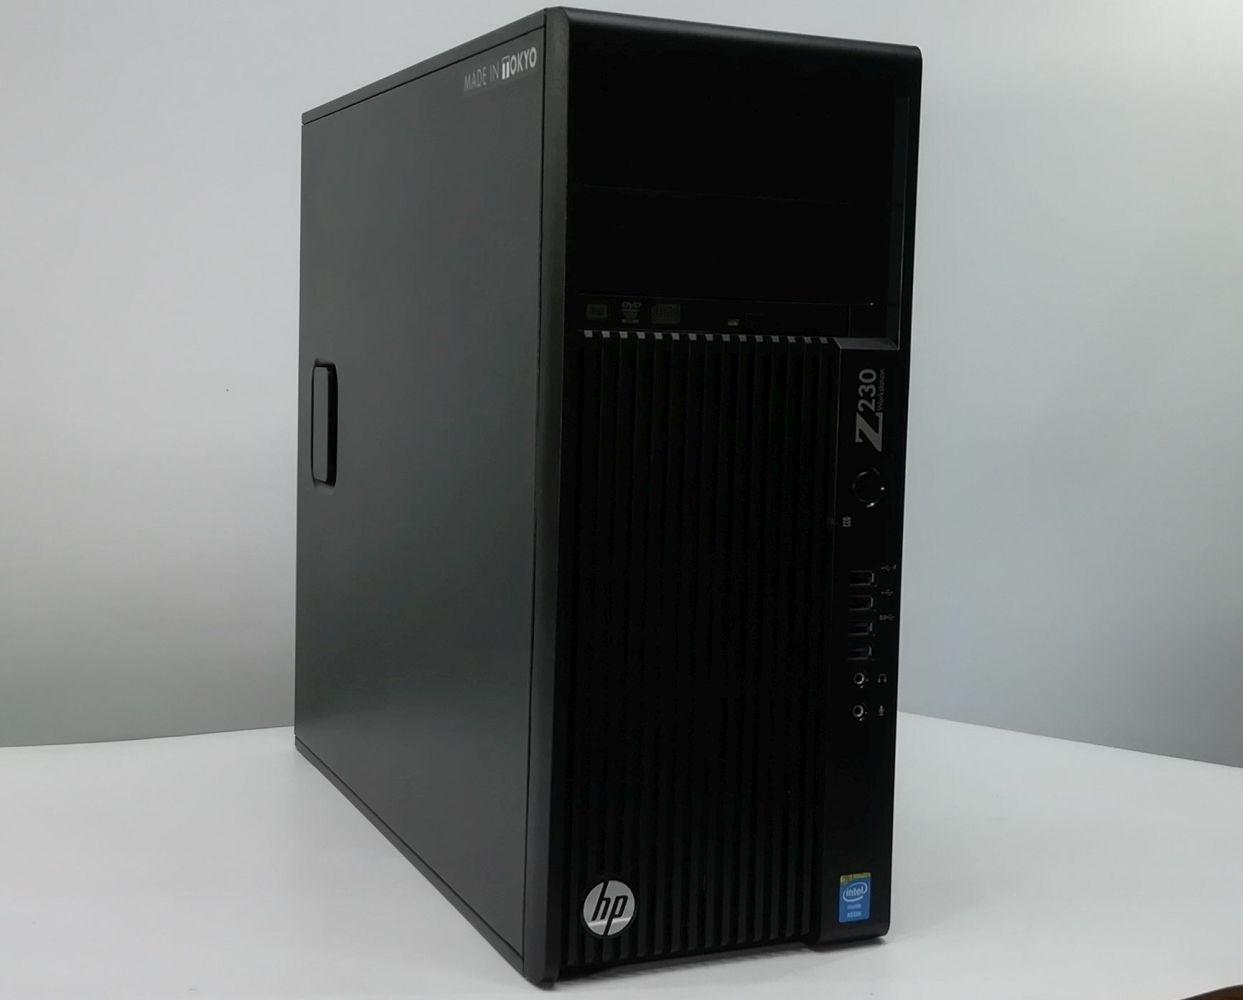 【GTX1650 SUPER搭載!】ゲーミングPC HP Z230 Tower Workstation Xeon E3-1230 v3 メモリ16GB SSD256GB HDD2TB Windows10 Pro 64bit【送料無料】【100日保証】